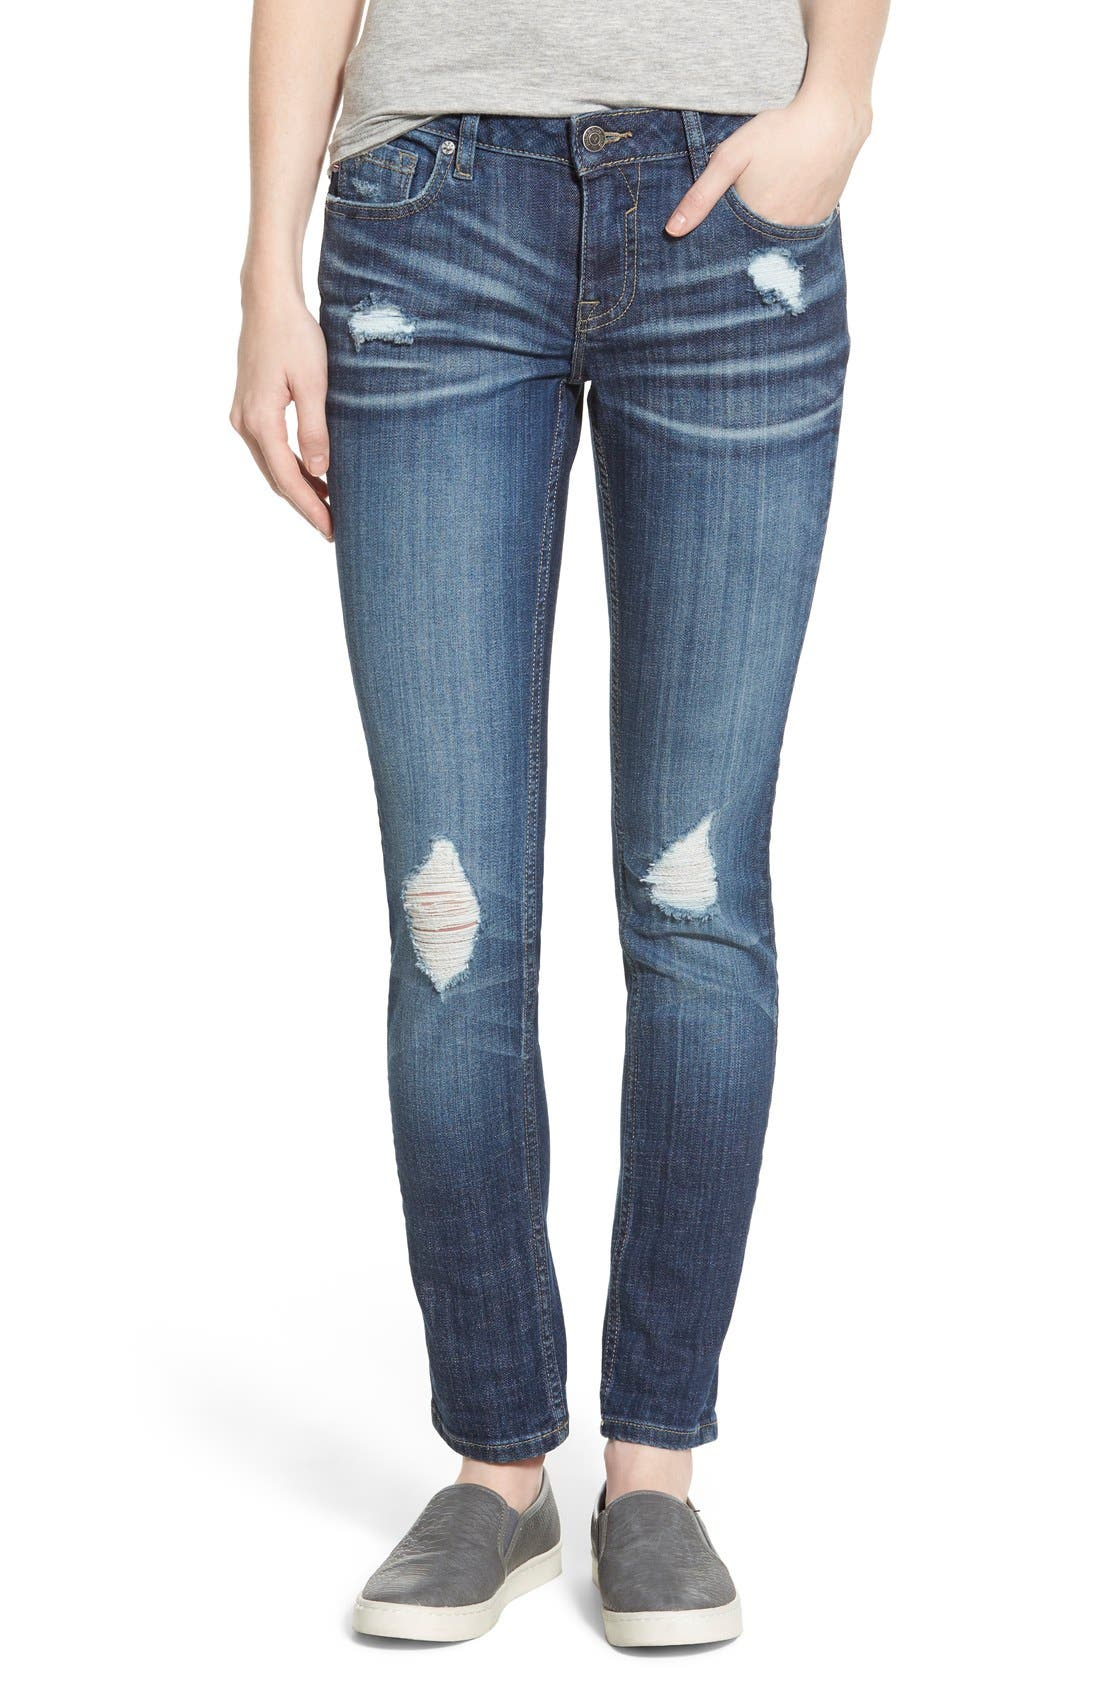 Alternate Image 1 Selected - Vigoss 'Tomboy' Destroyed Skinny Jeans